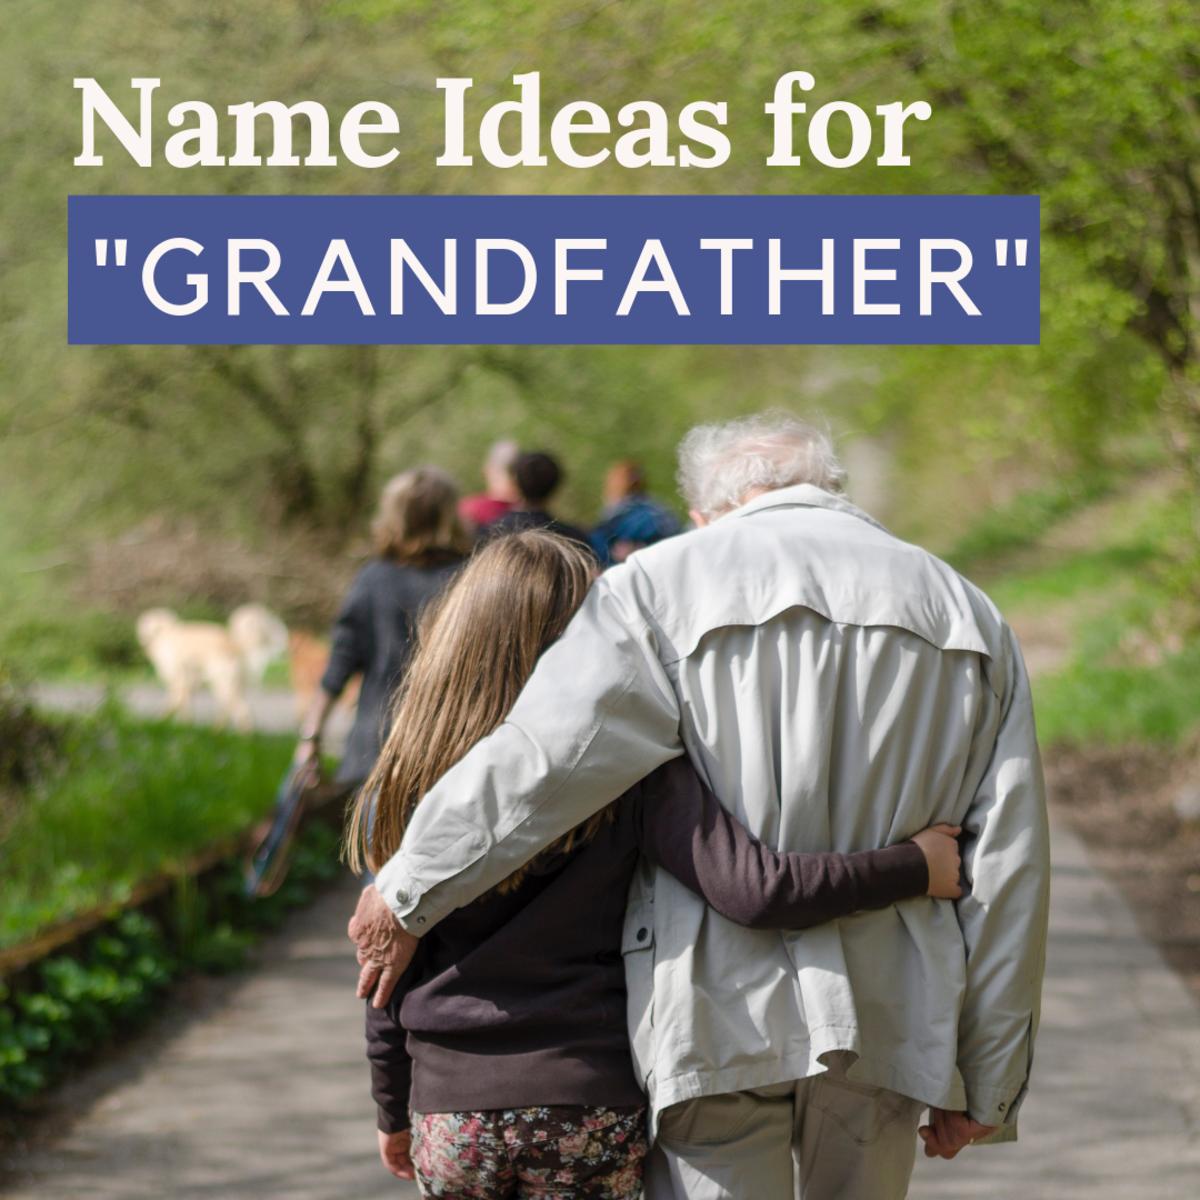 Alternative Name Ideas for Grandpa